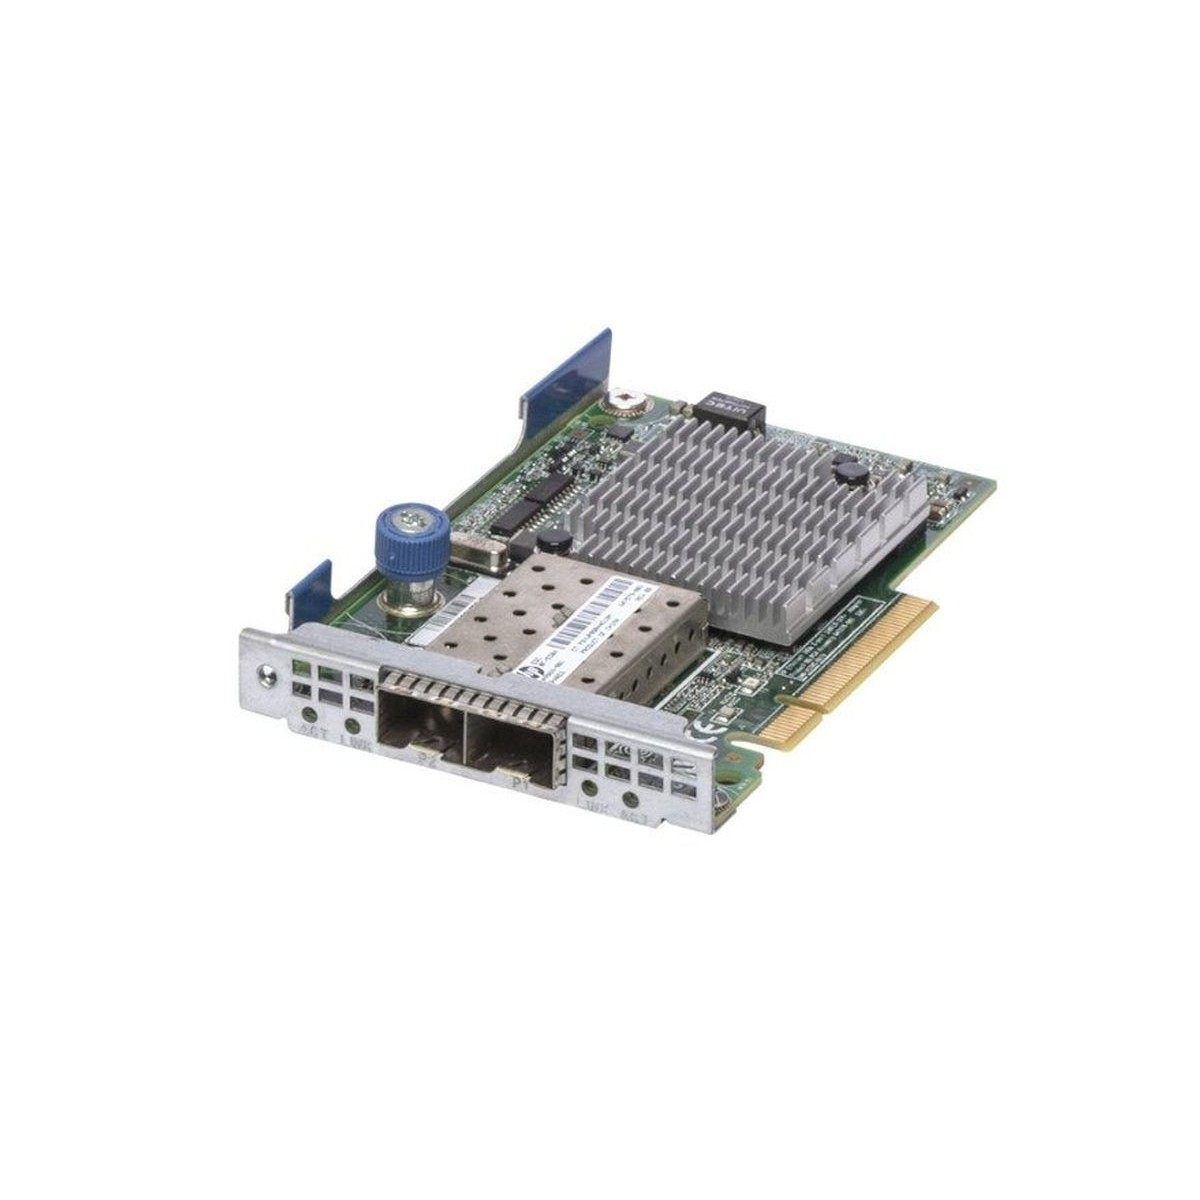 DELL WD VelociRaptor 300GB SATA 10K WD3000HLFS 0N965M